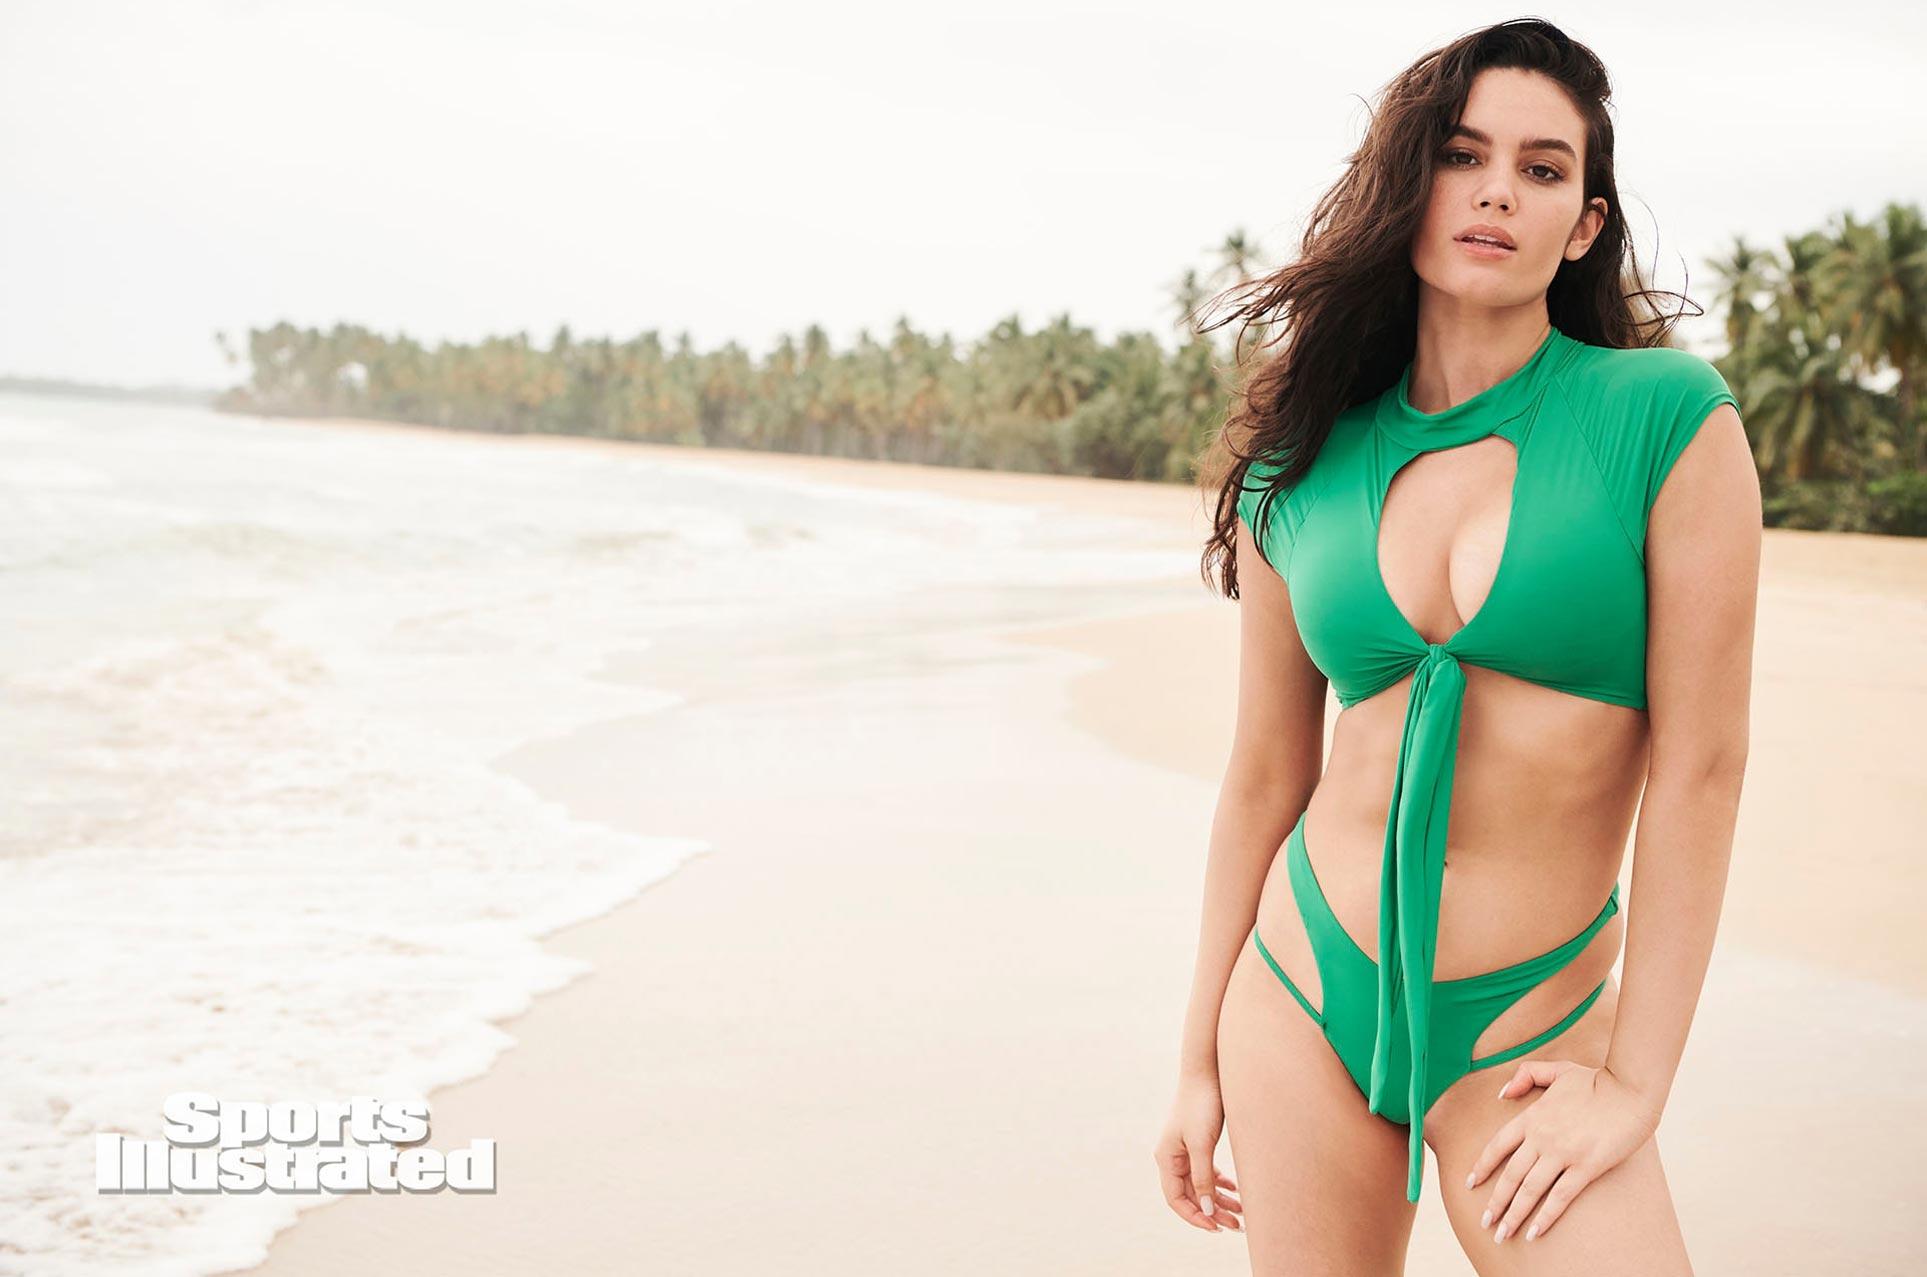 Энн де Паула в каталоге купальников Sports Illustrated Swimsuit 2020 / фото 22